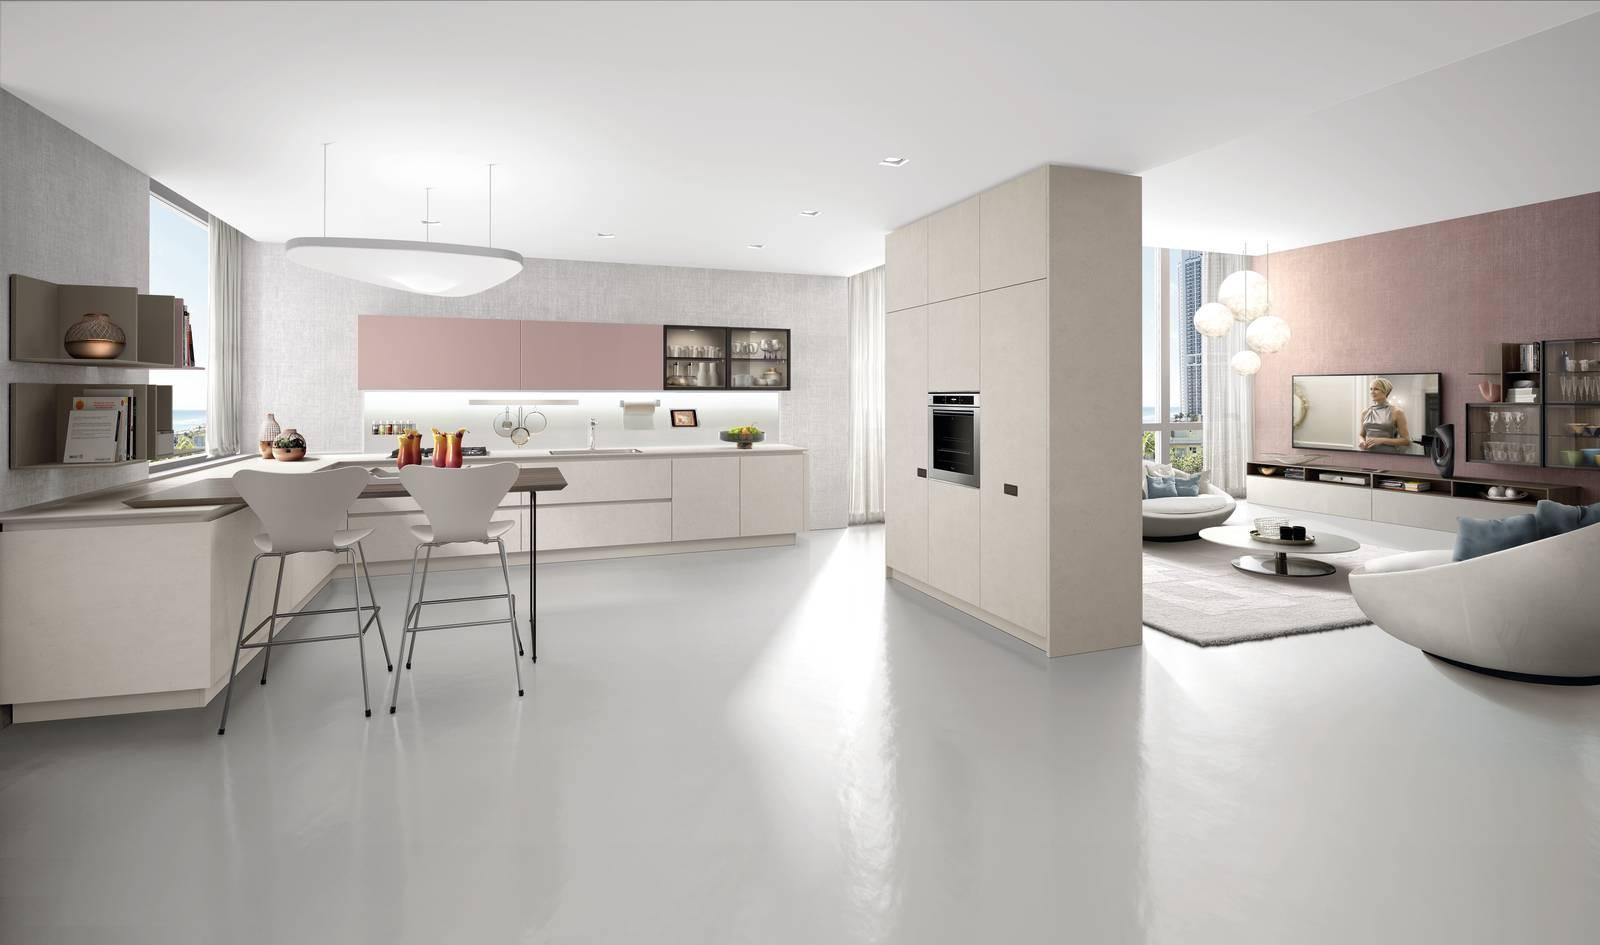 Cucina Soggiorno A Elle | Cucine Open Space Moderne Roma, Cucina ...